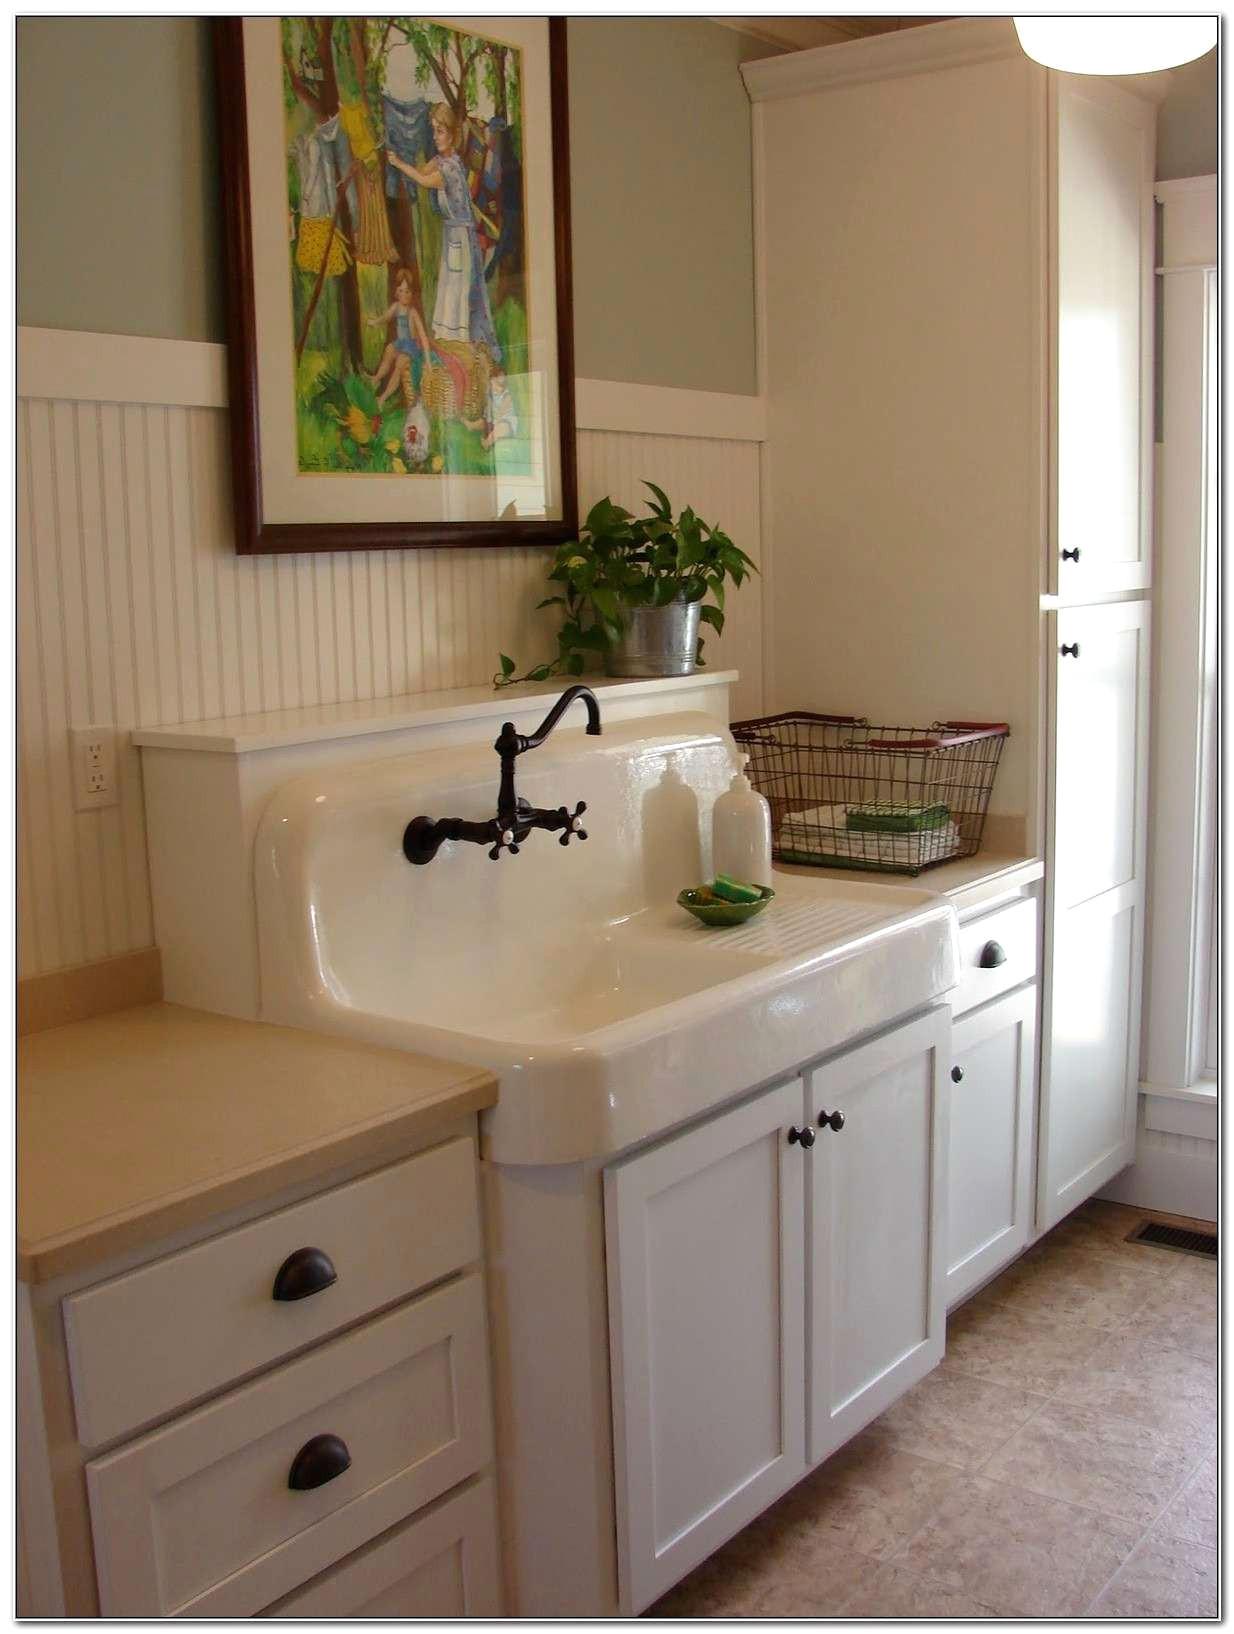 kitchen sink farmhouse style awesome cheap kitchen remodel hd vintage sinkh sink farmhouse sinks sinki 0d kitchen sink farmhouse style best